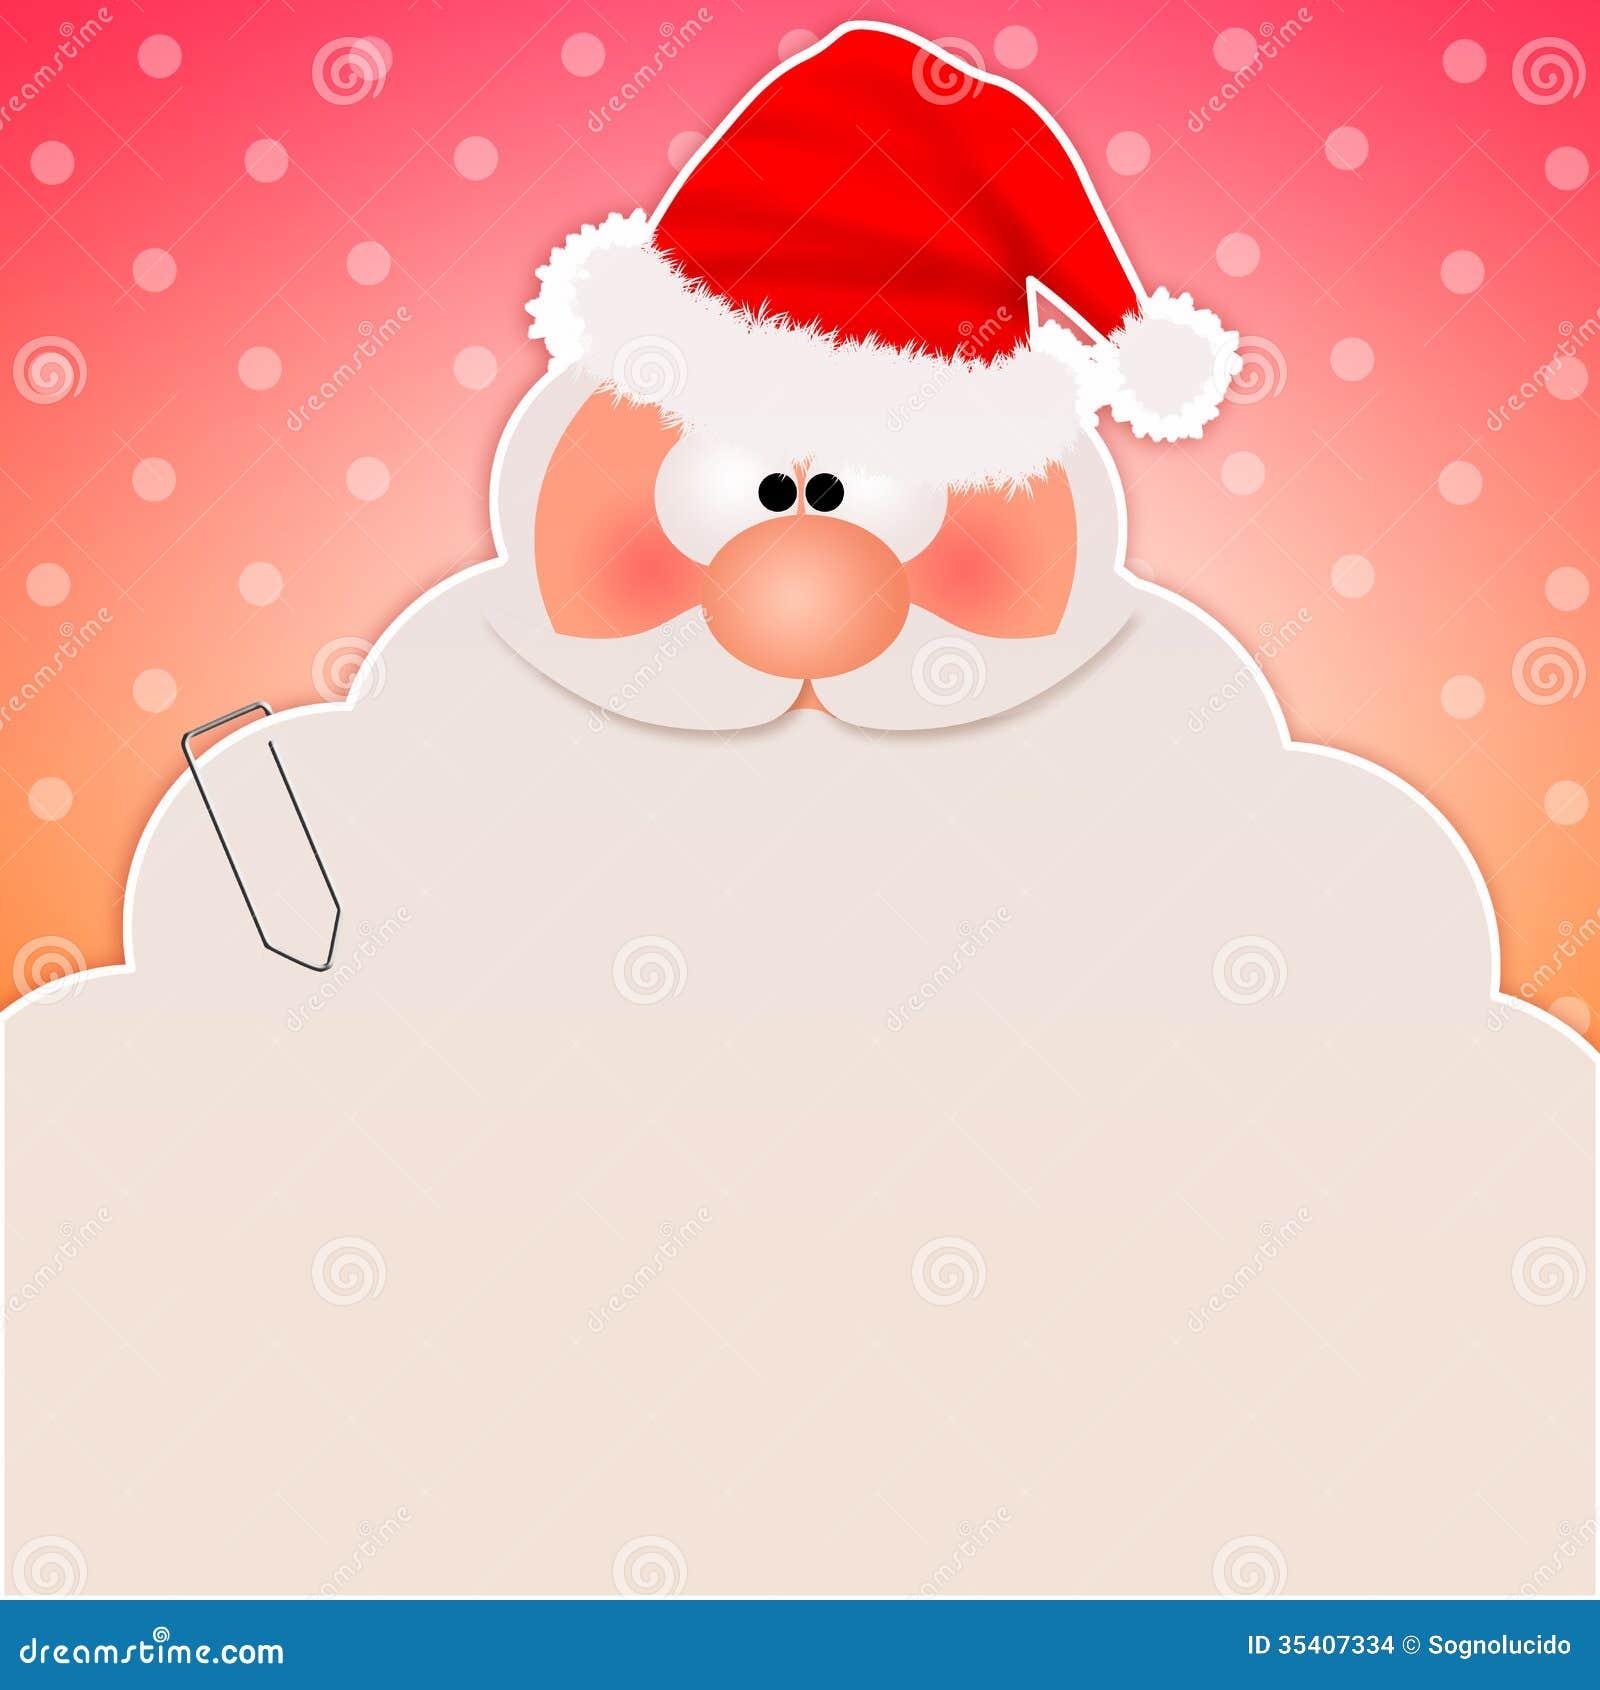 List For Christmas Wish   New Calendar Template Site